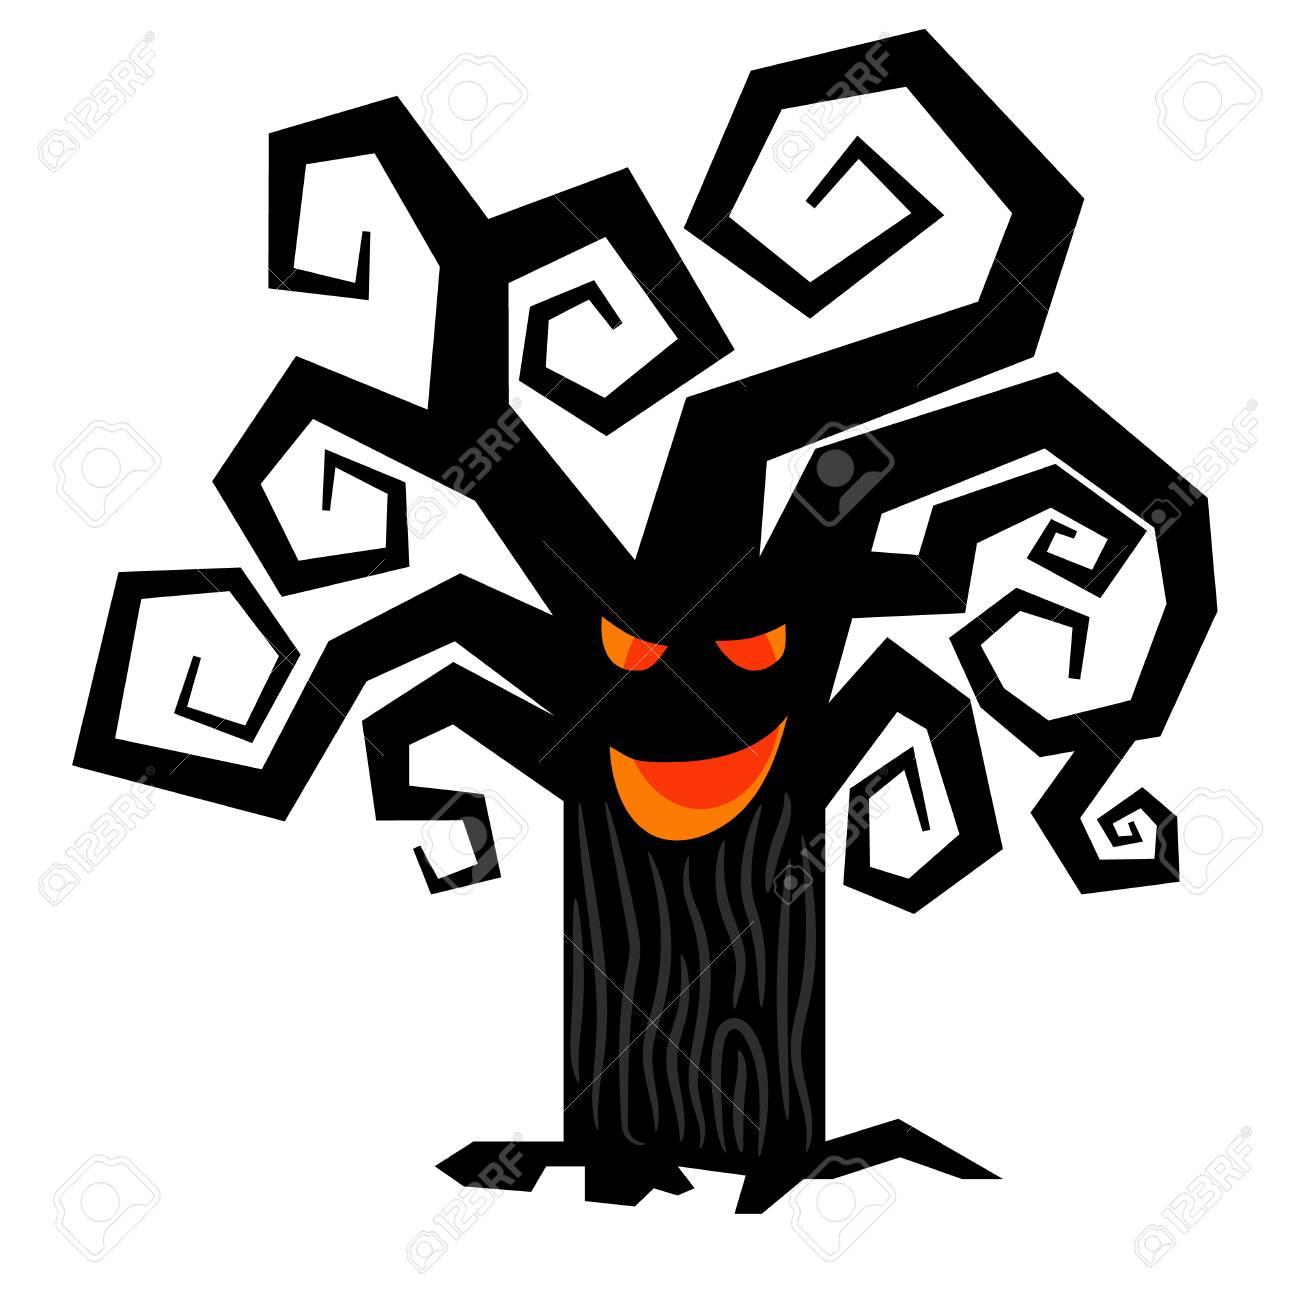 scary halloween tree vector spooky creepy dark treesisolated